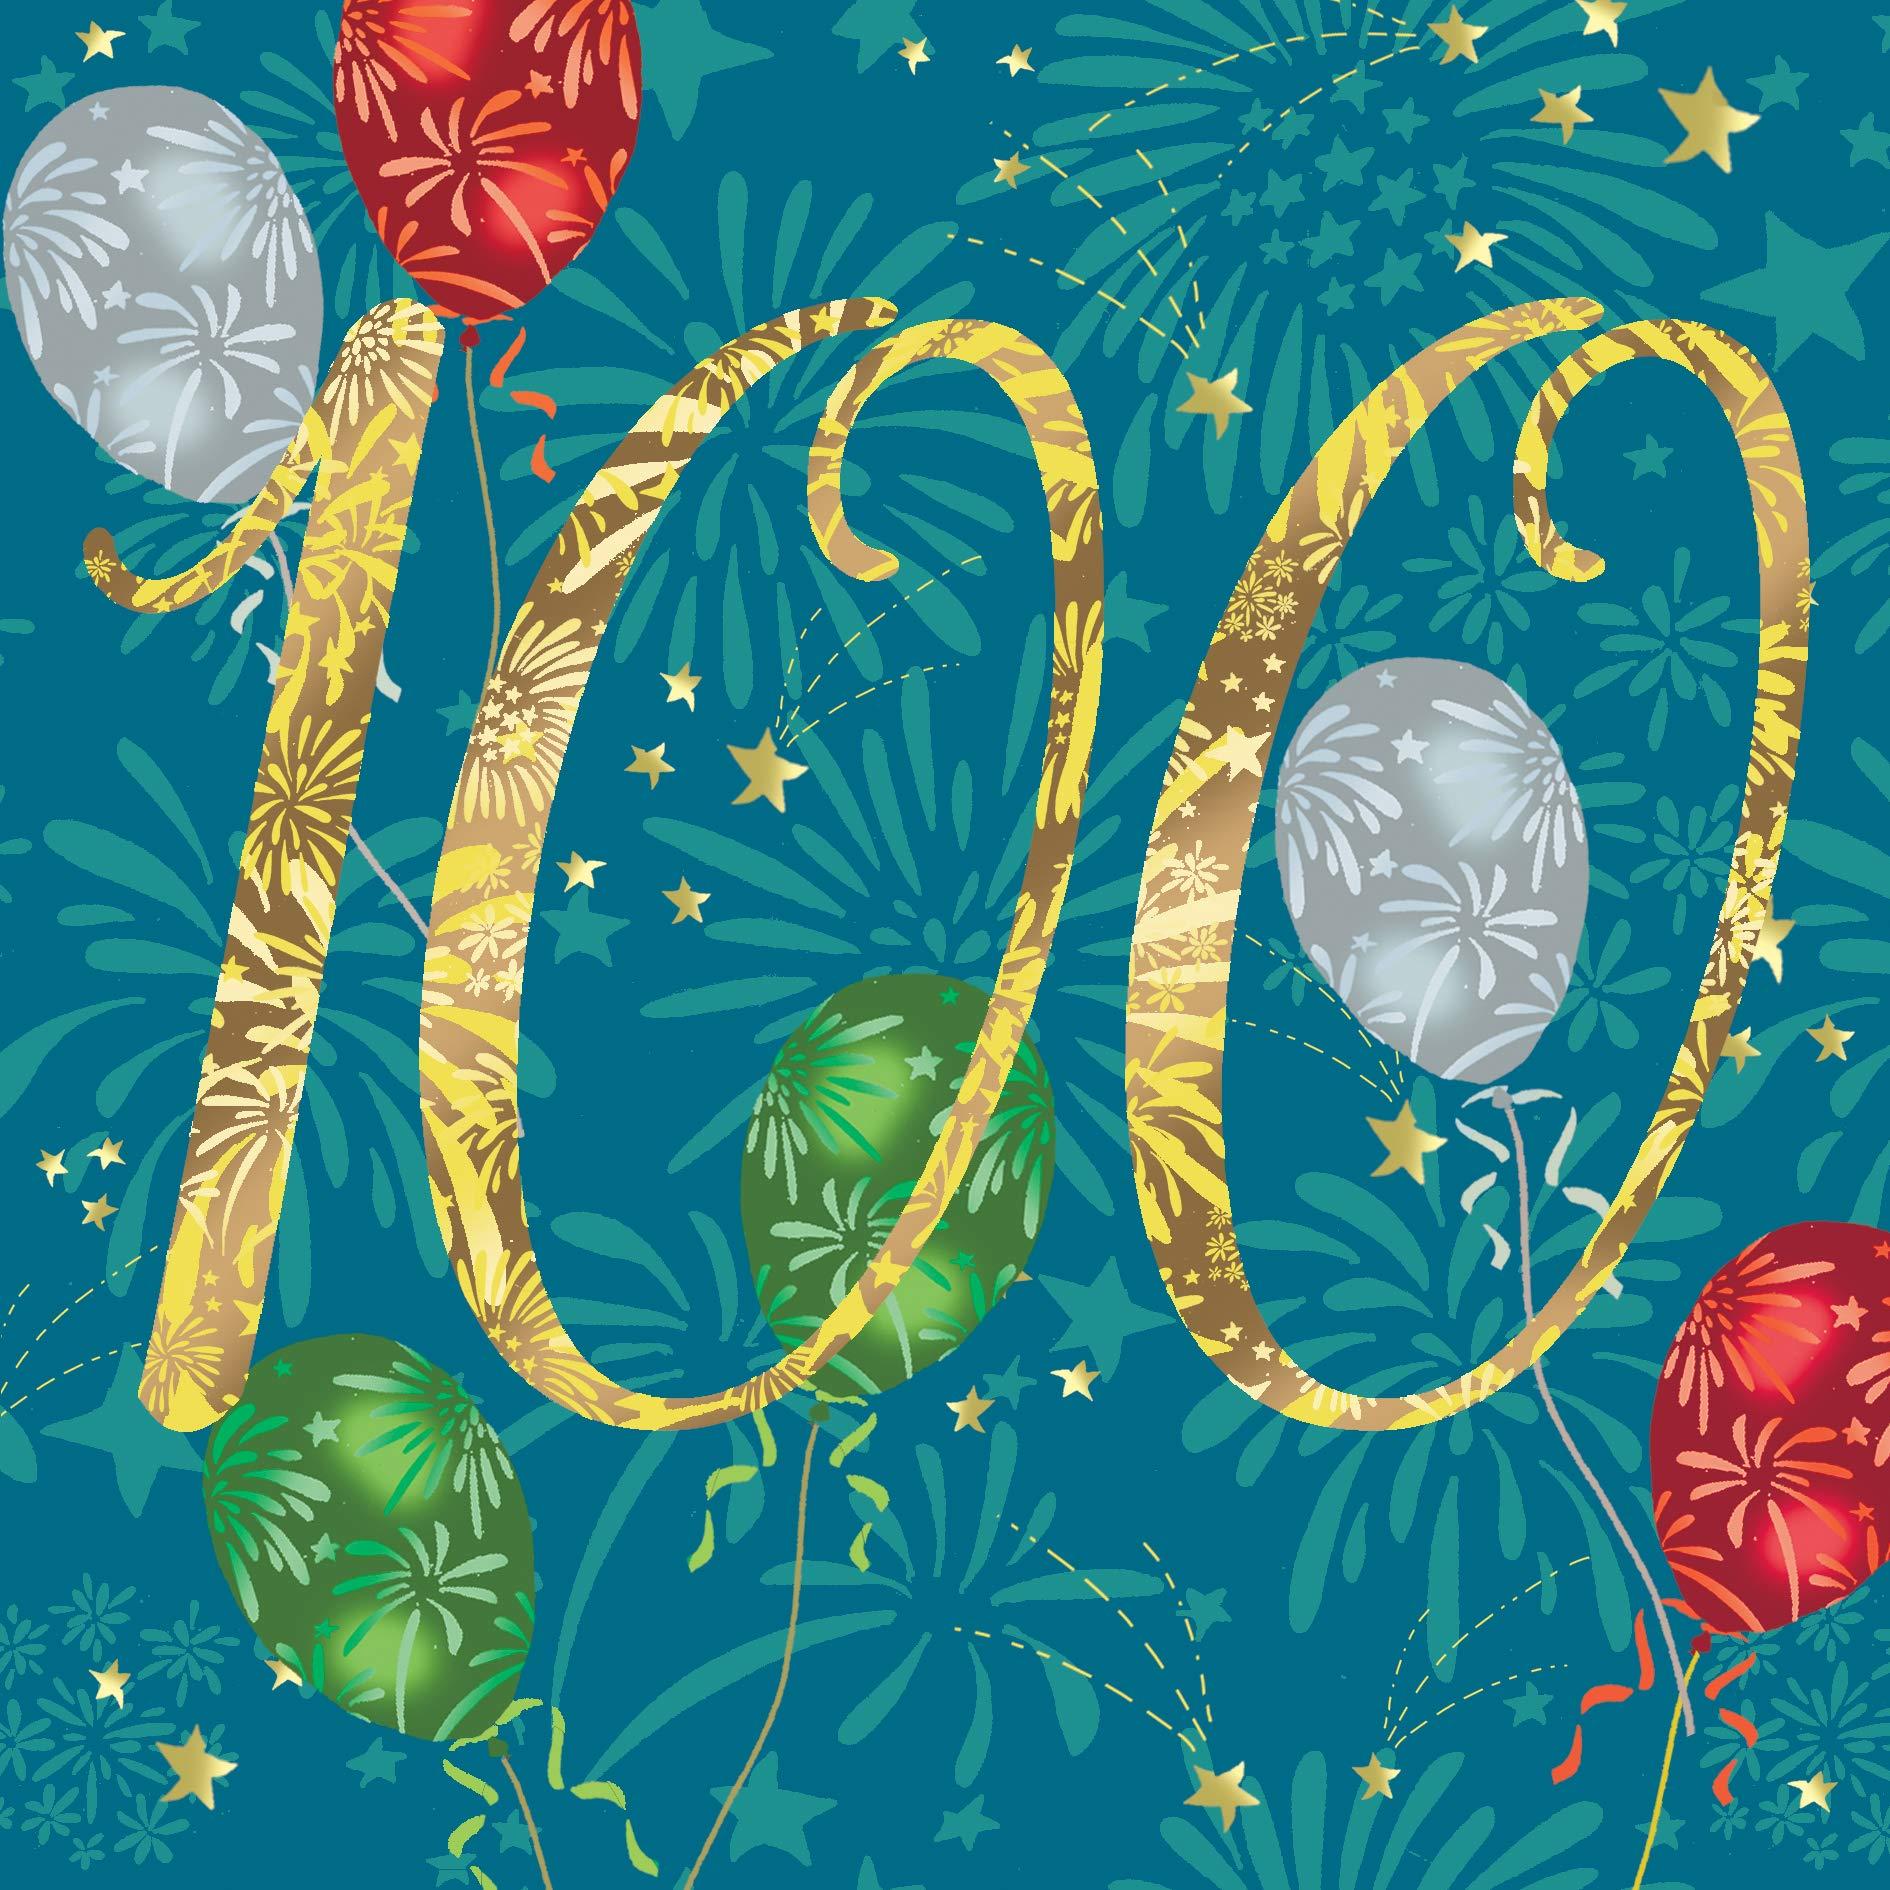 Twizler Unisex Age 100 Birthday Card – 100th Birthday Card for Her – 100th Birthday Card for Him – 100 Years Old – Male…